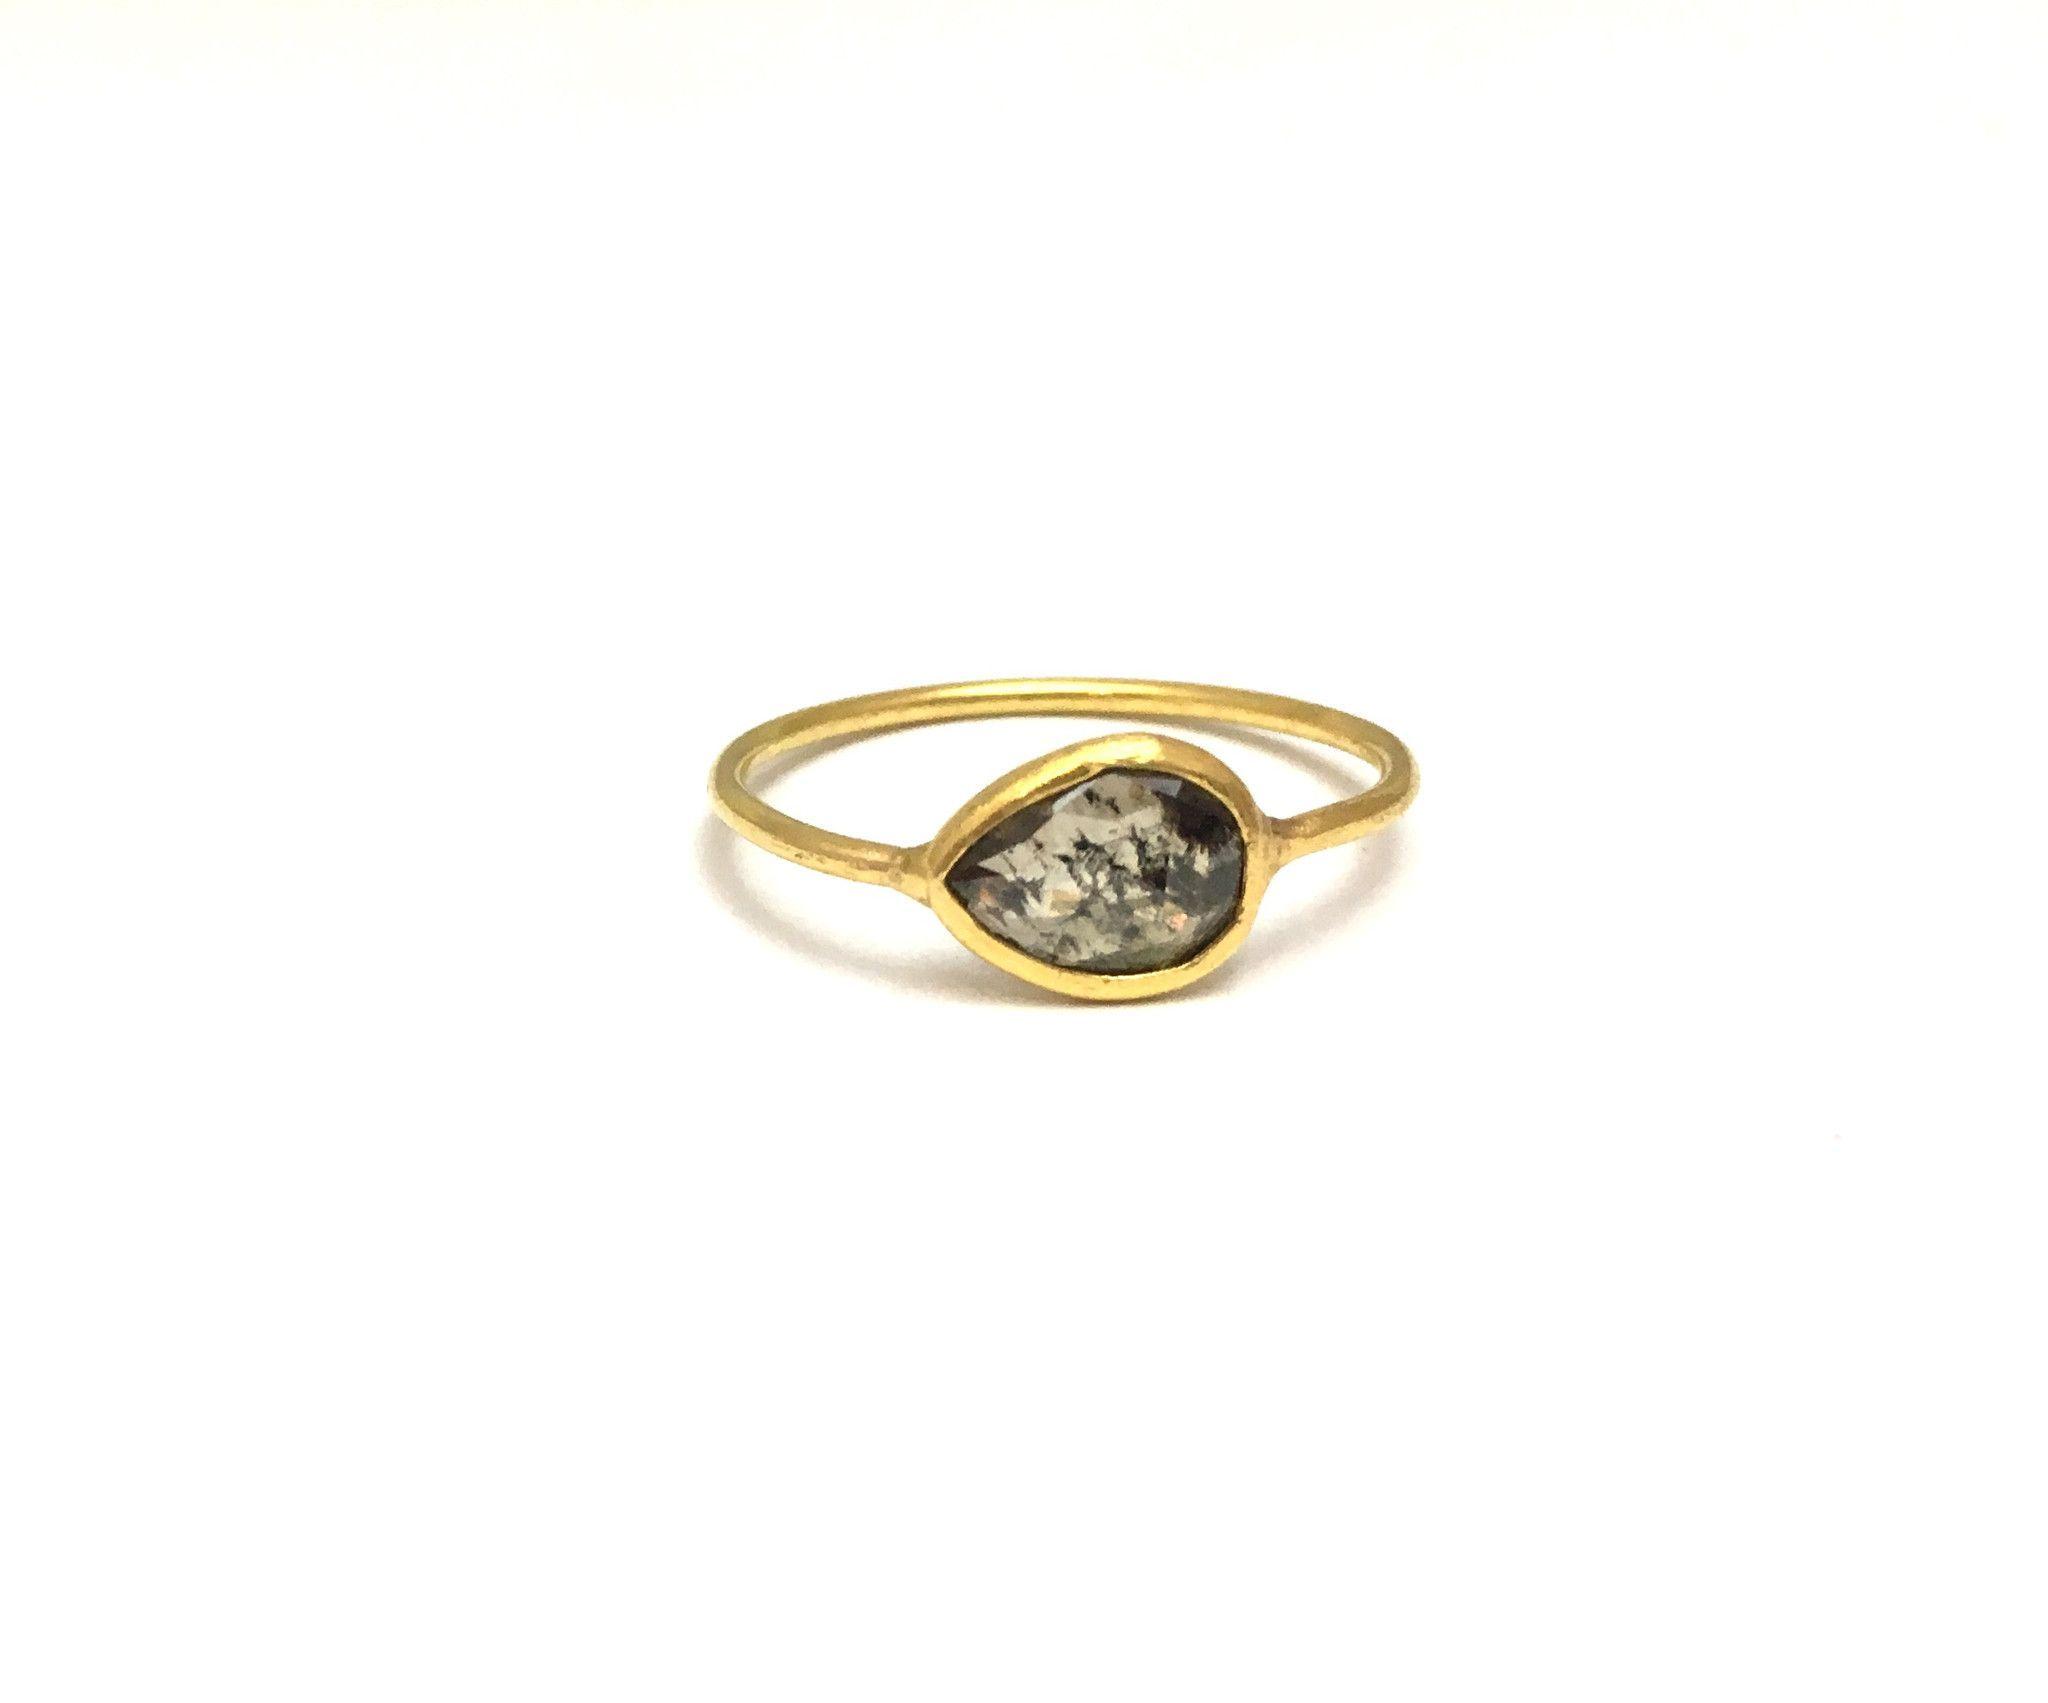 18K Rosecut Pear Shaped Rough Diamond Slice Ring